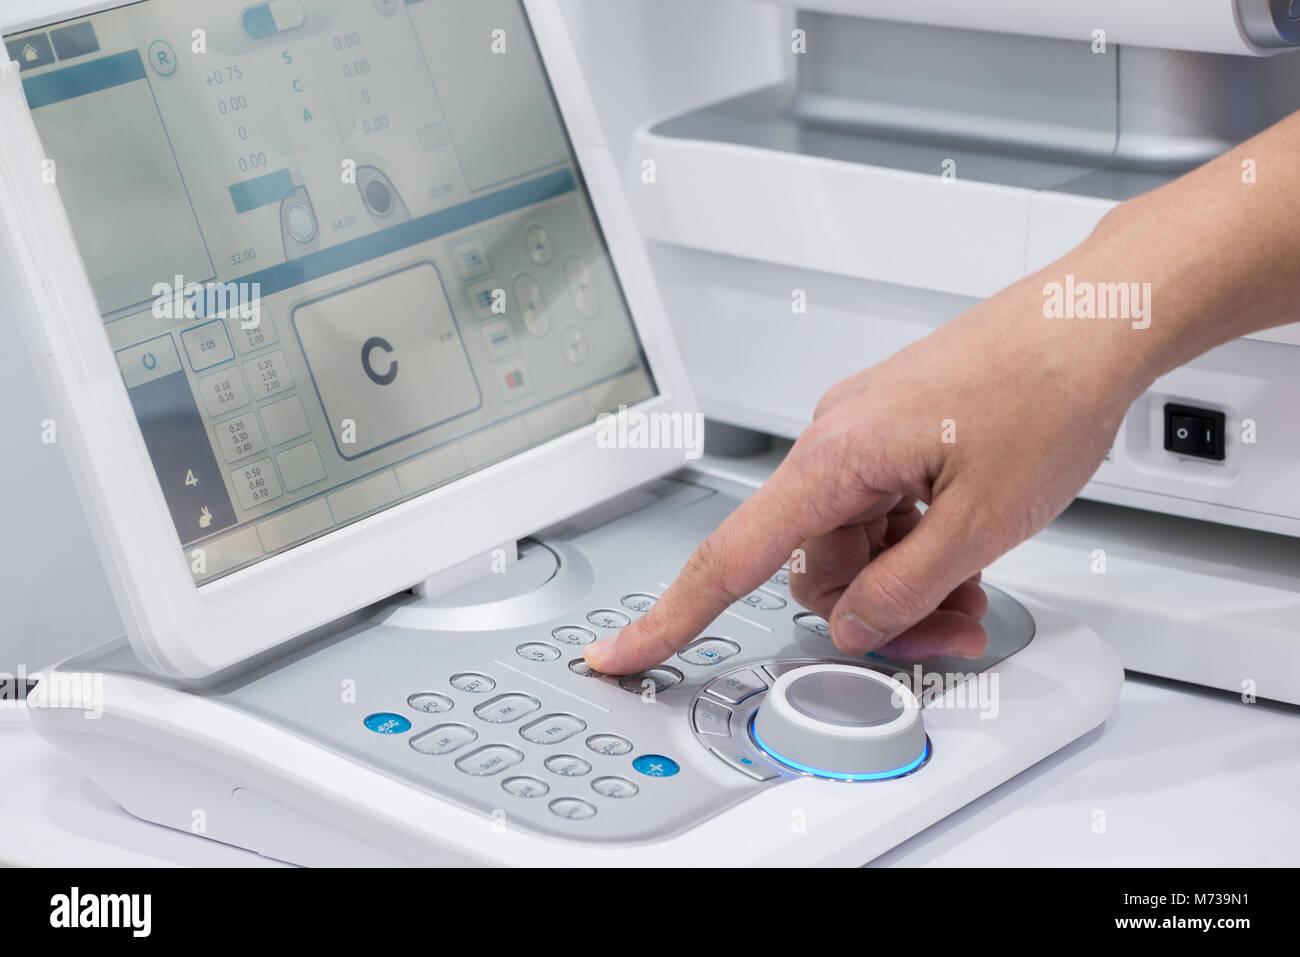 doctor oculist at work. diagnostic ophthalmologic equipment. medicine concept - Stock Image